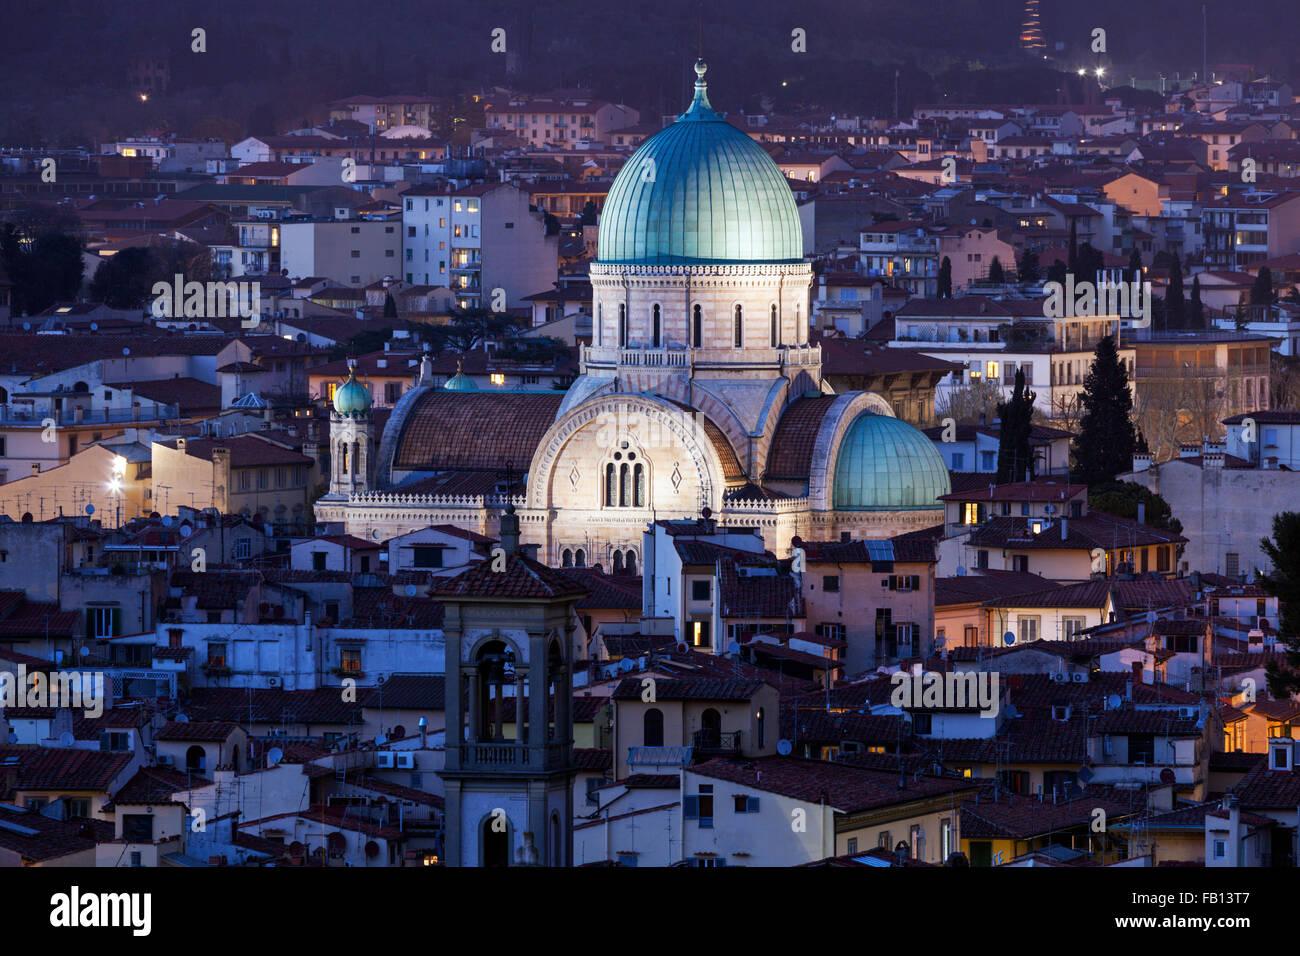 Große Synagoge von Florenz Stockbild